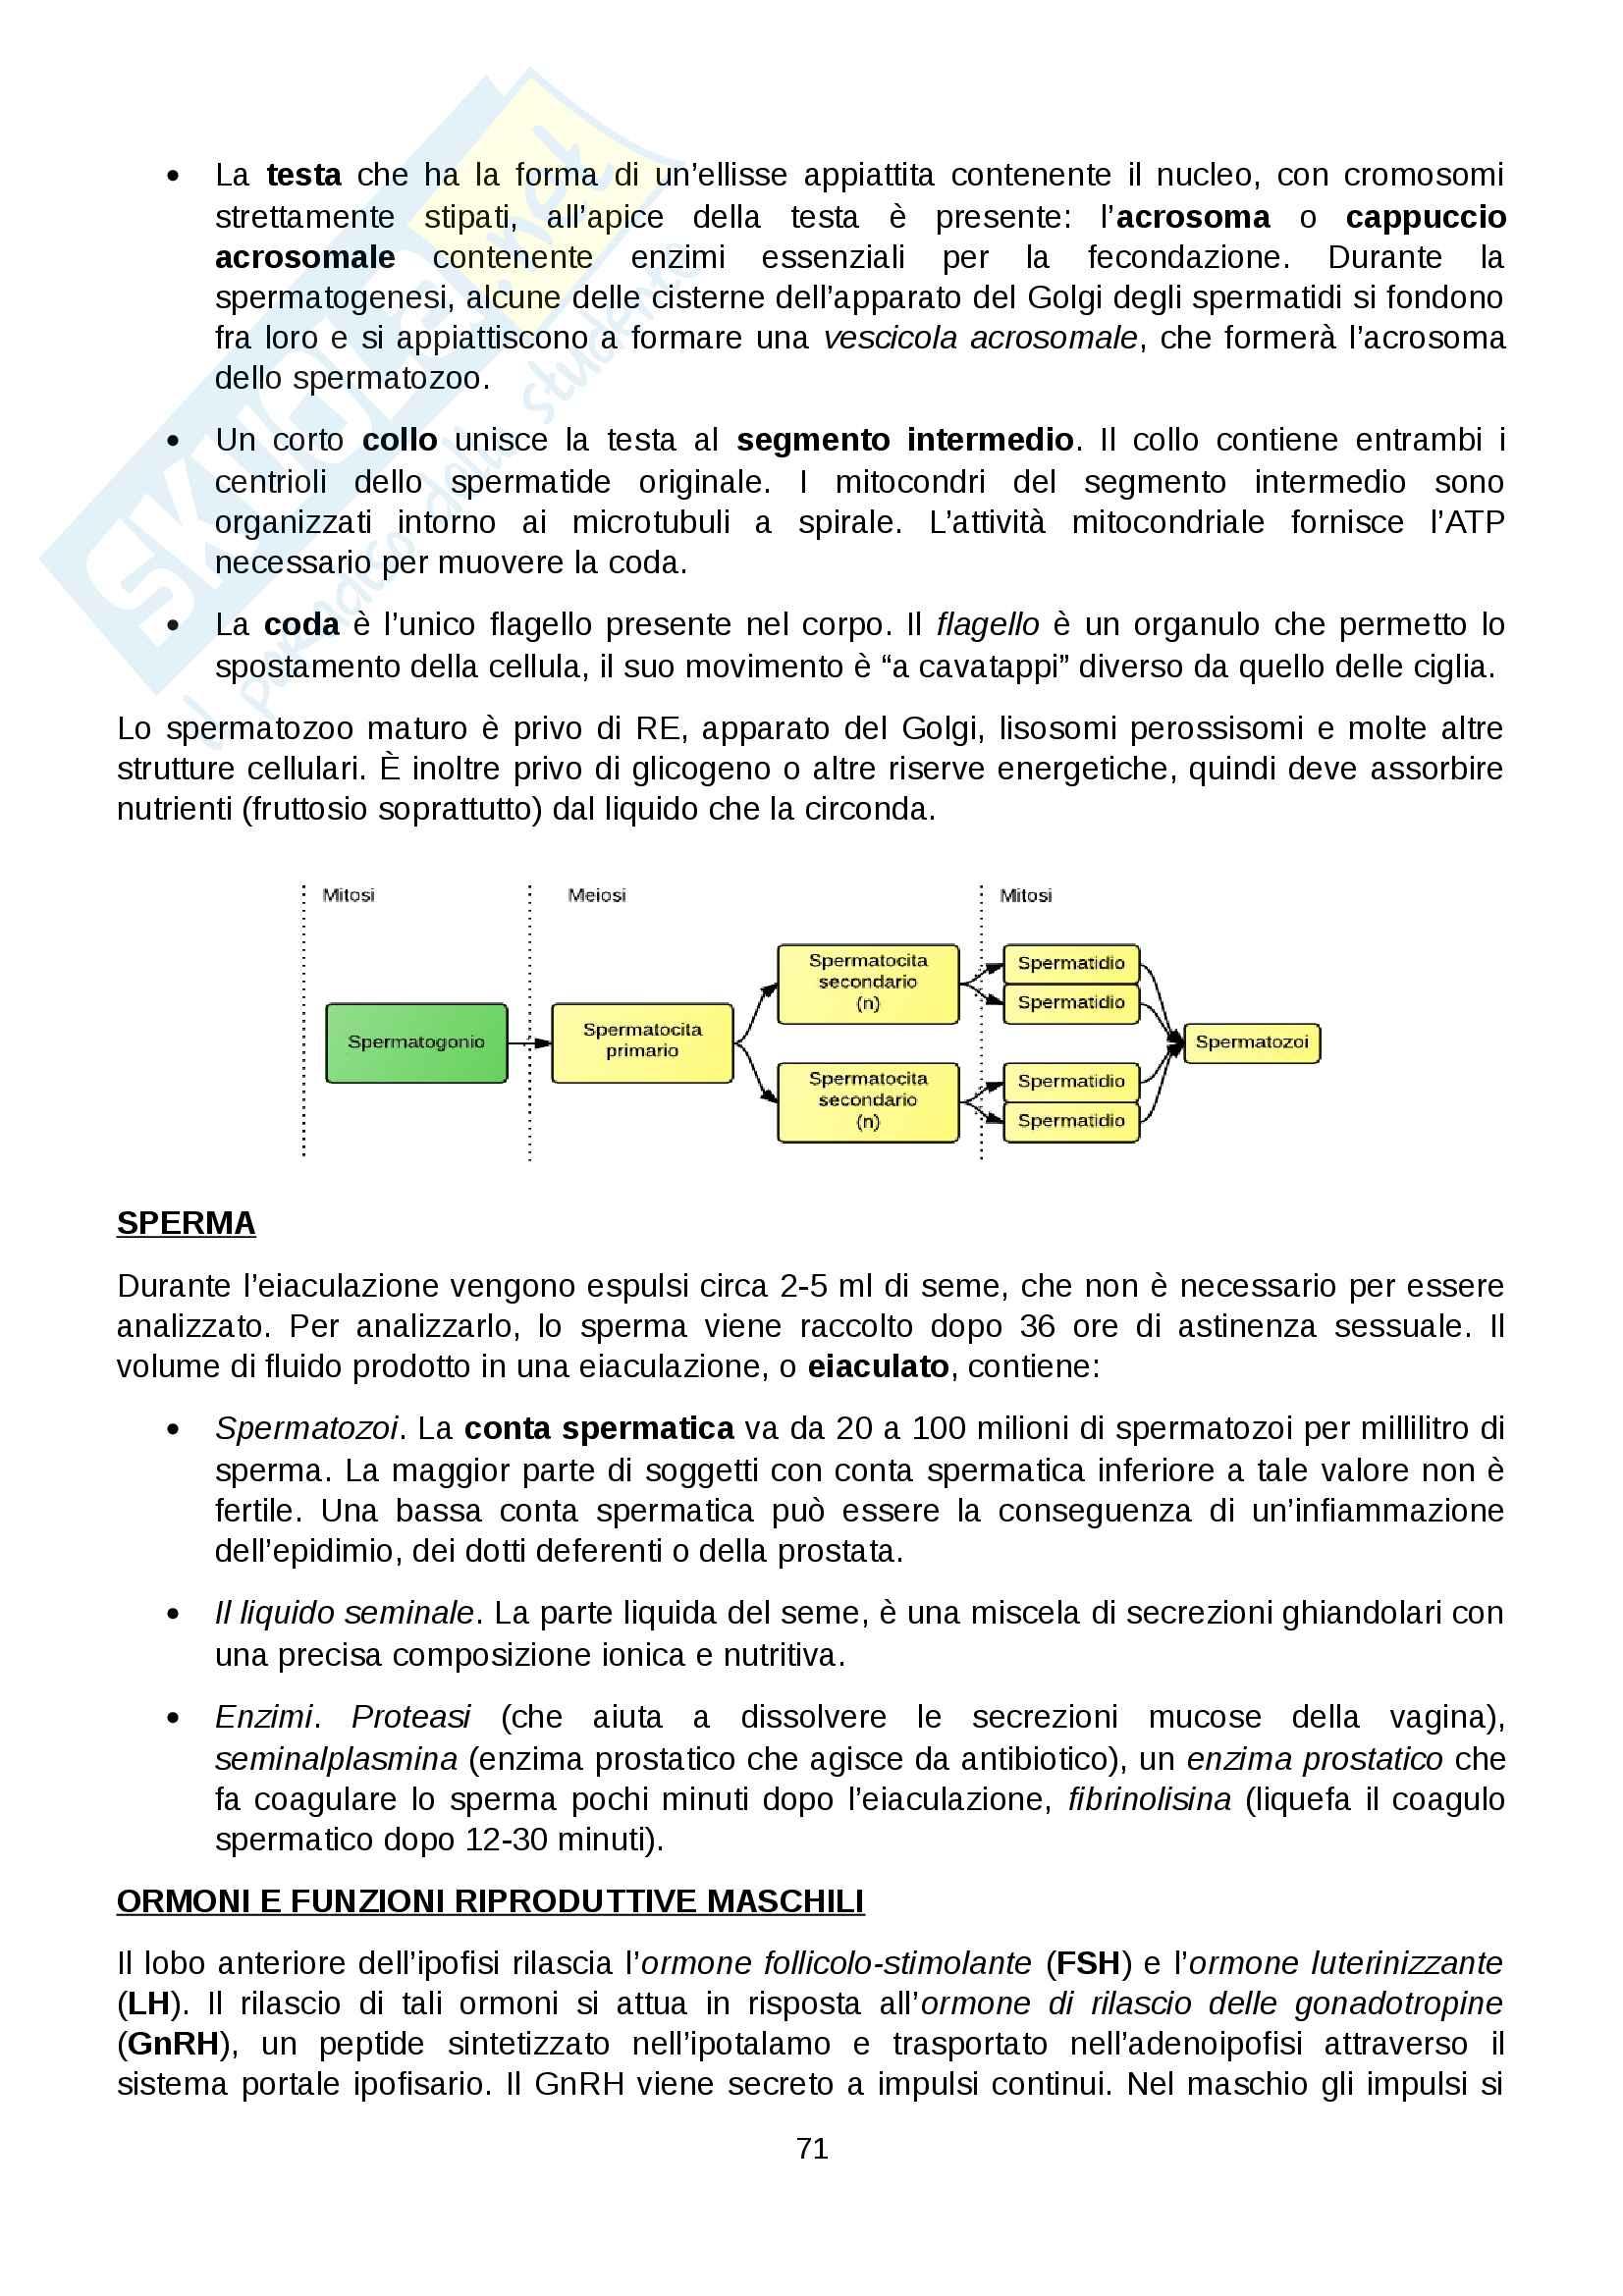 Anatomia umana - Completa Pag. 71